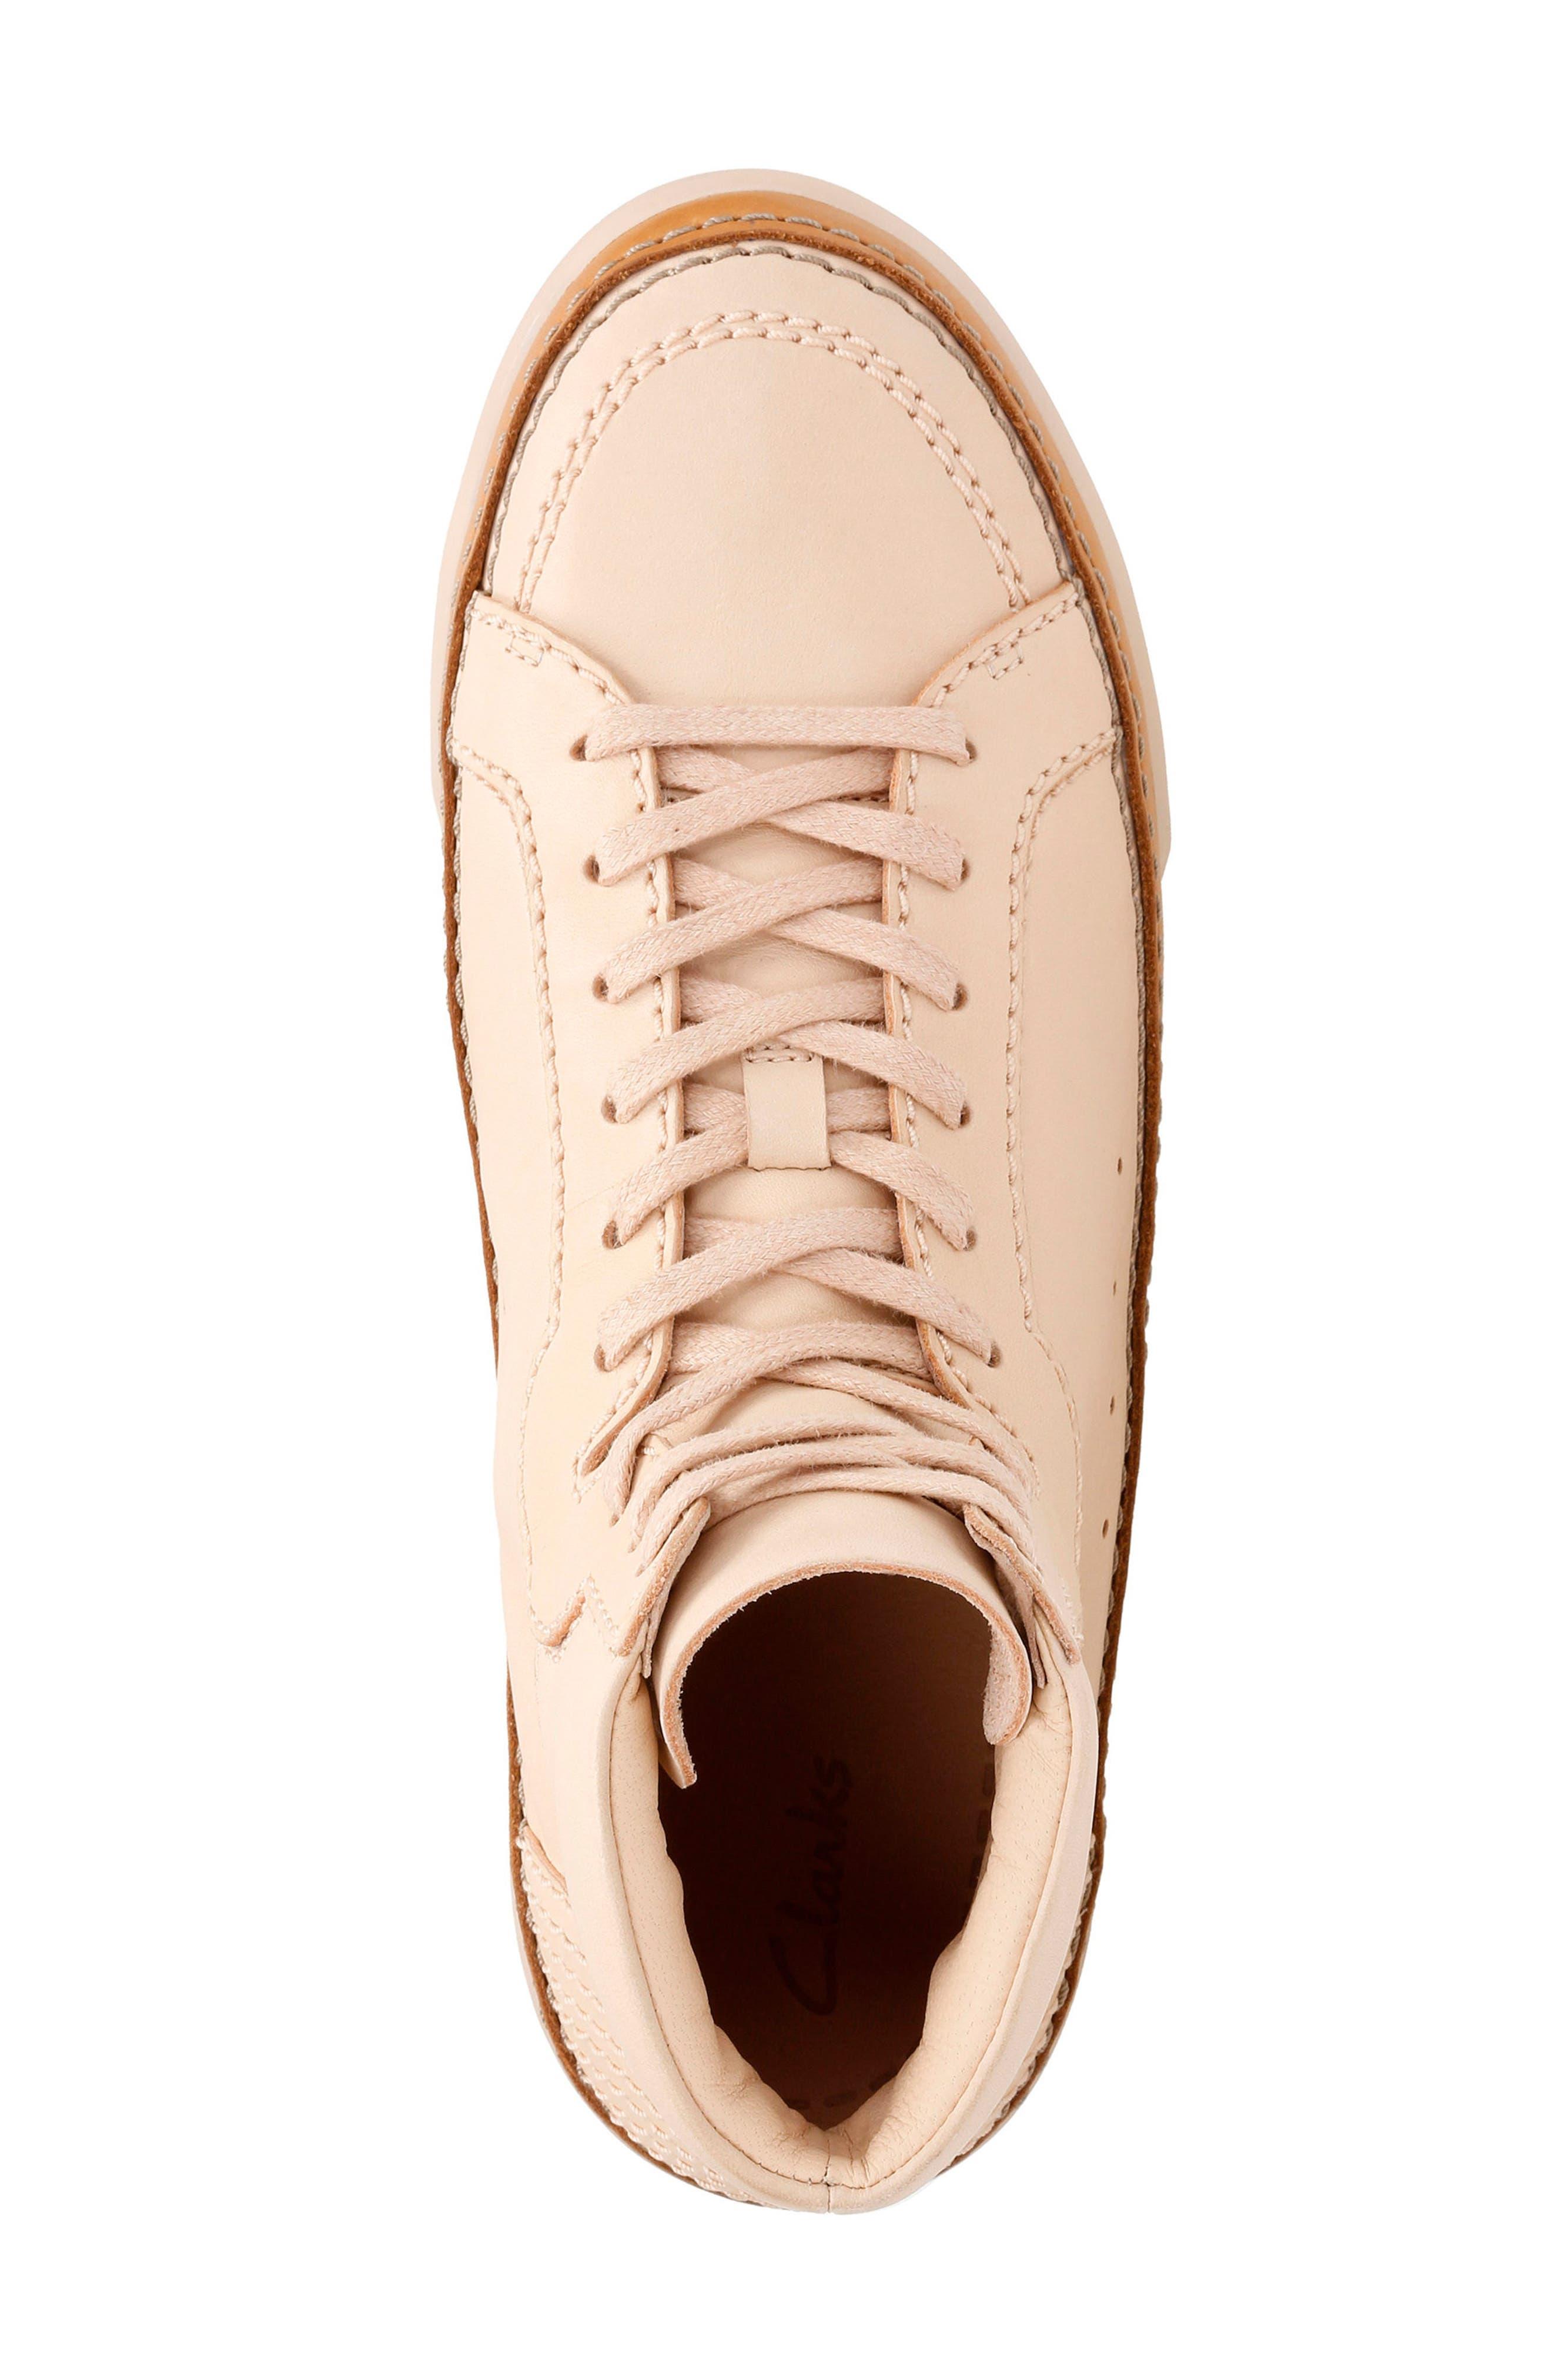 Hidi Haze High Top Sneaker,                             Alternate thumbnail 8, color,